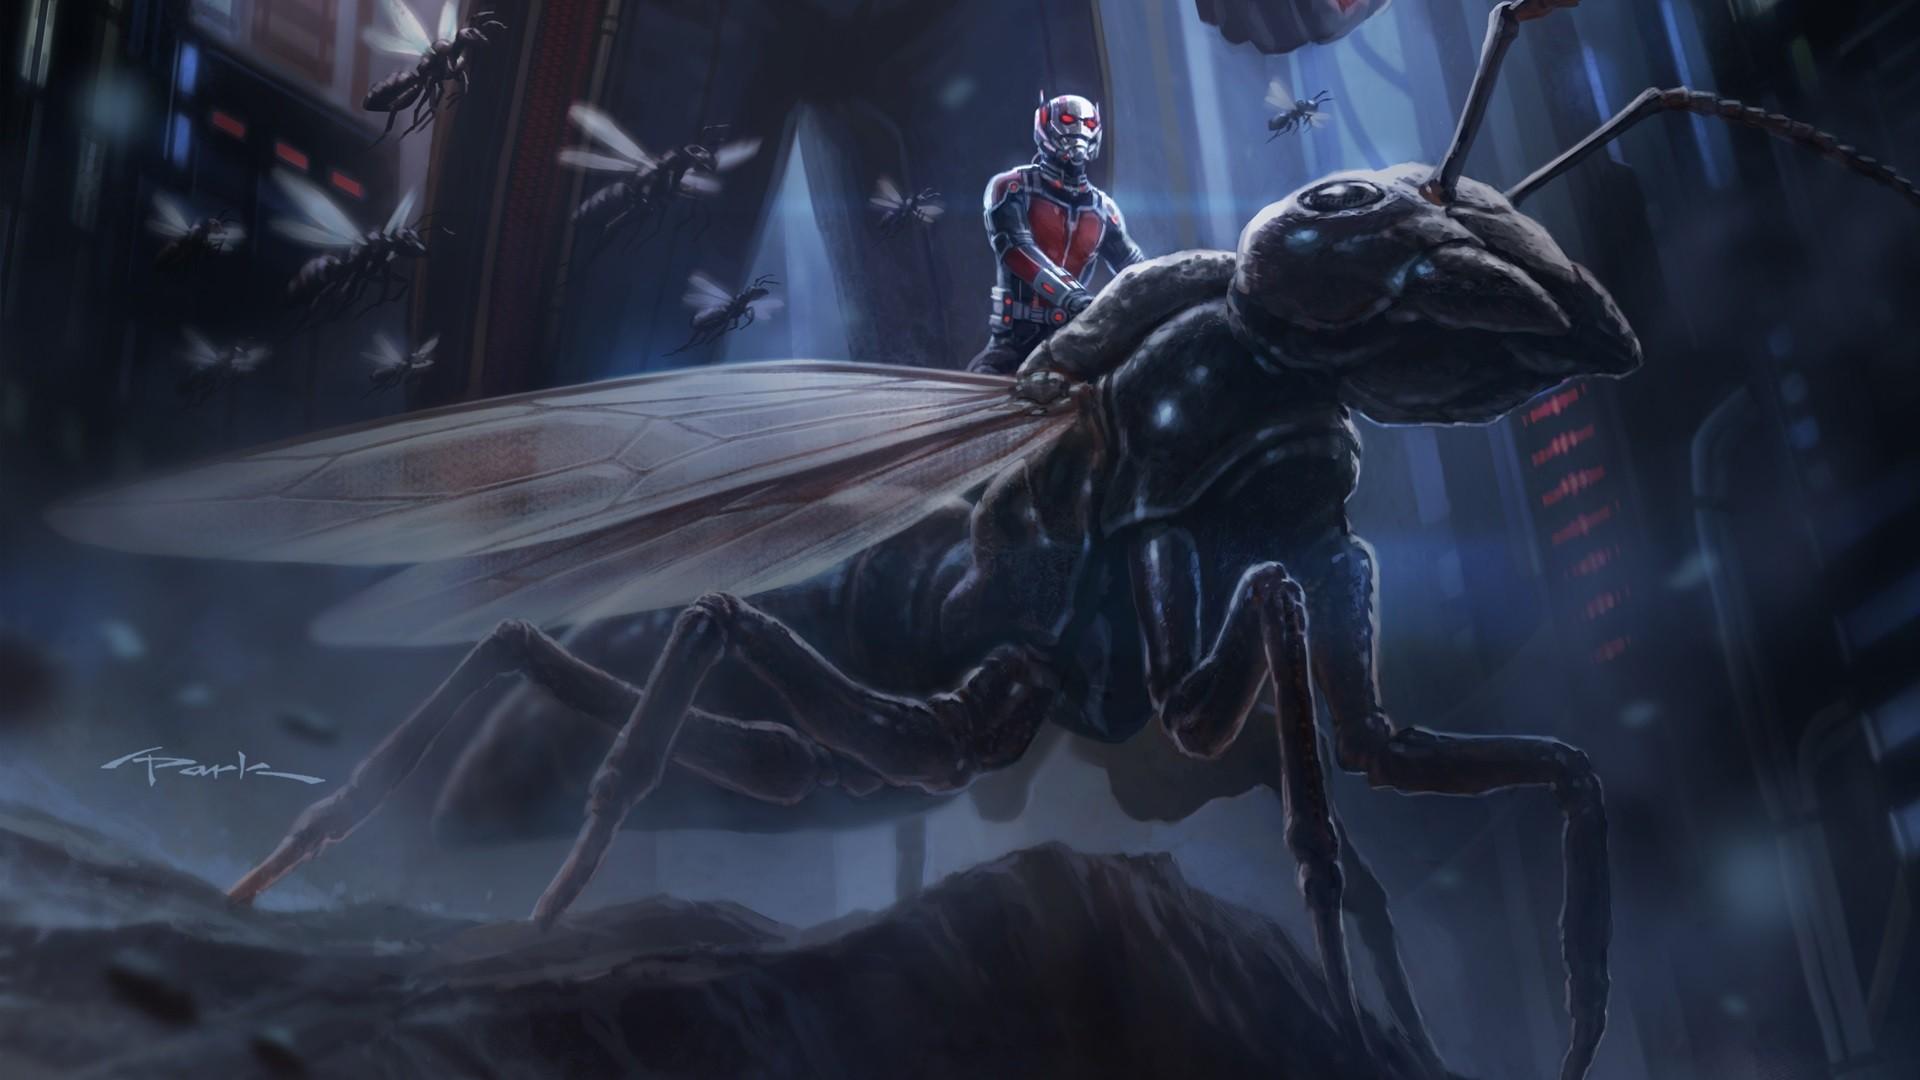 Картинки муравей и человек